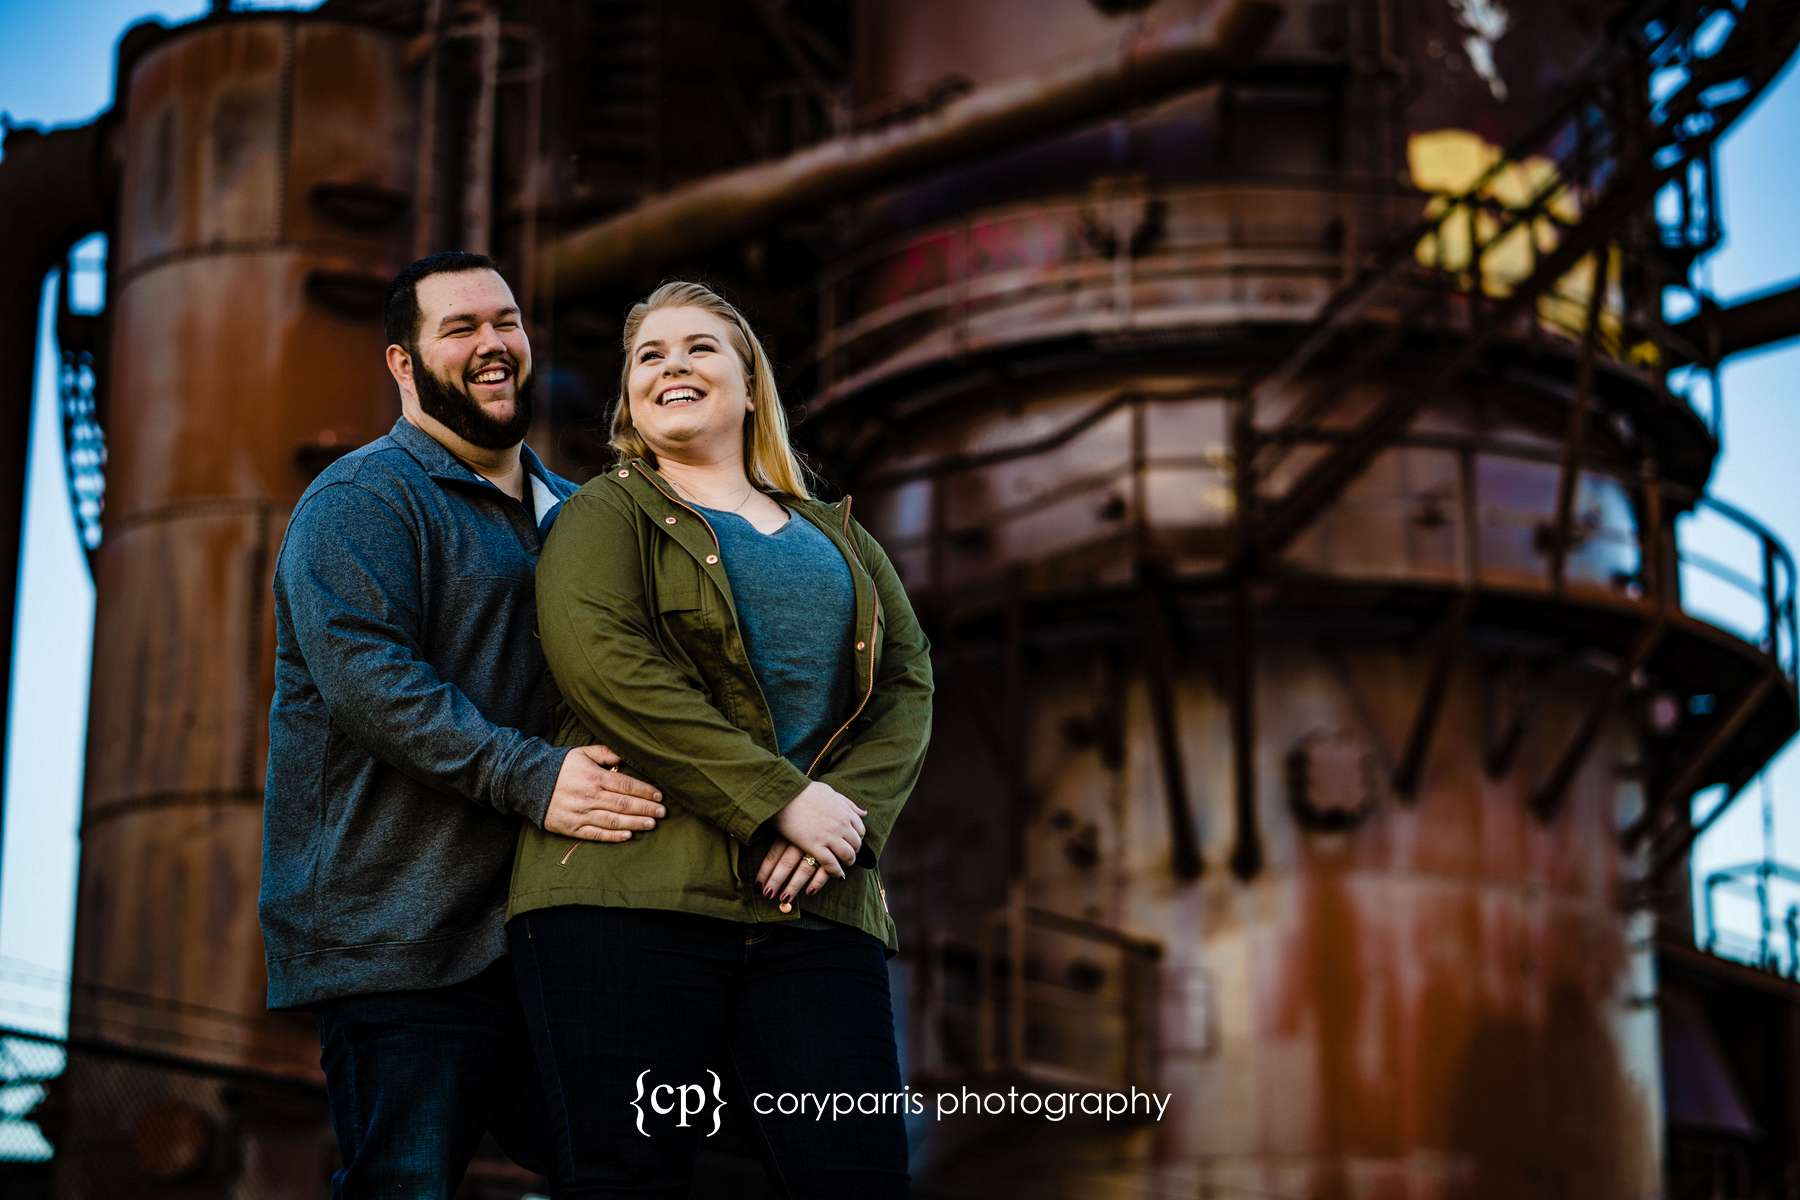 086-Gas-Works-Park-Engagement-Portraits-Seattle.jpg